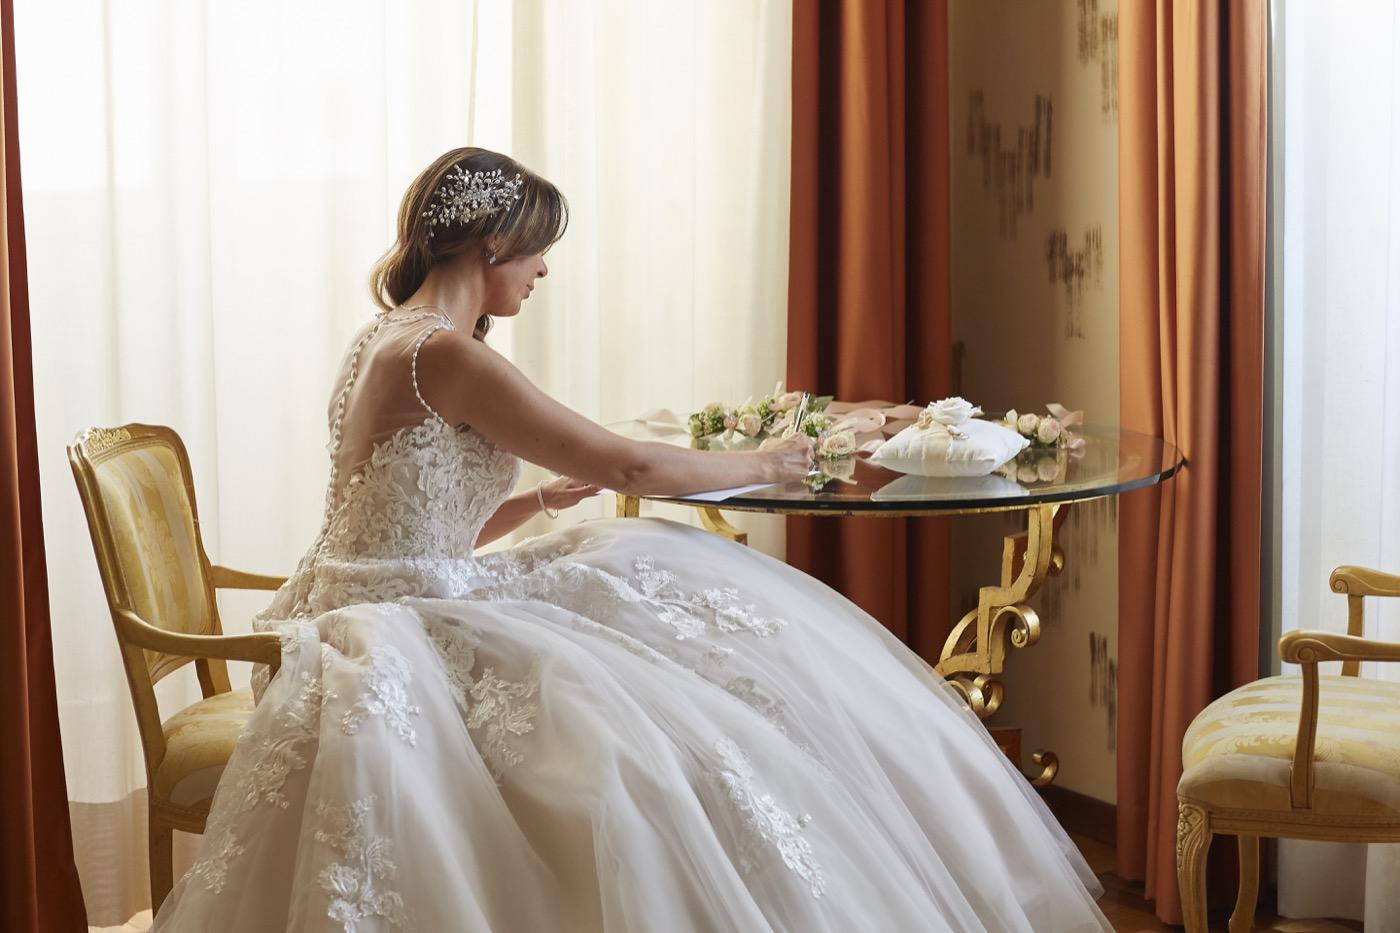 Claudio-Coppola-wedding-photographer-la-scuderia-eventi-preparativi-la-rosetta-perugia-33